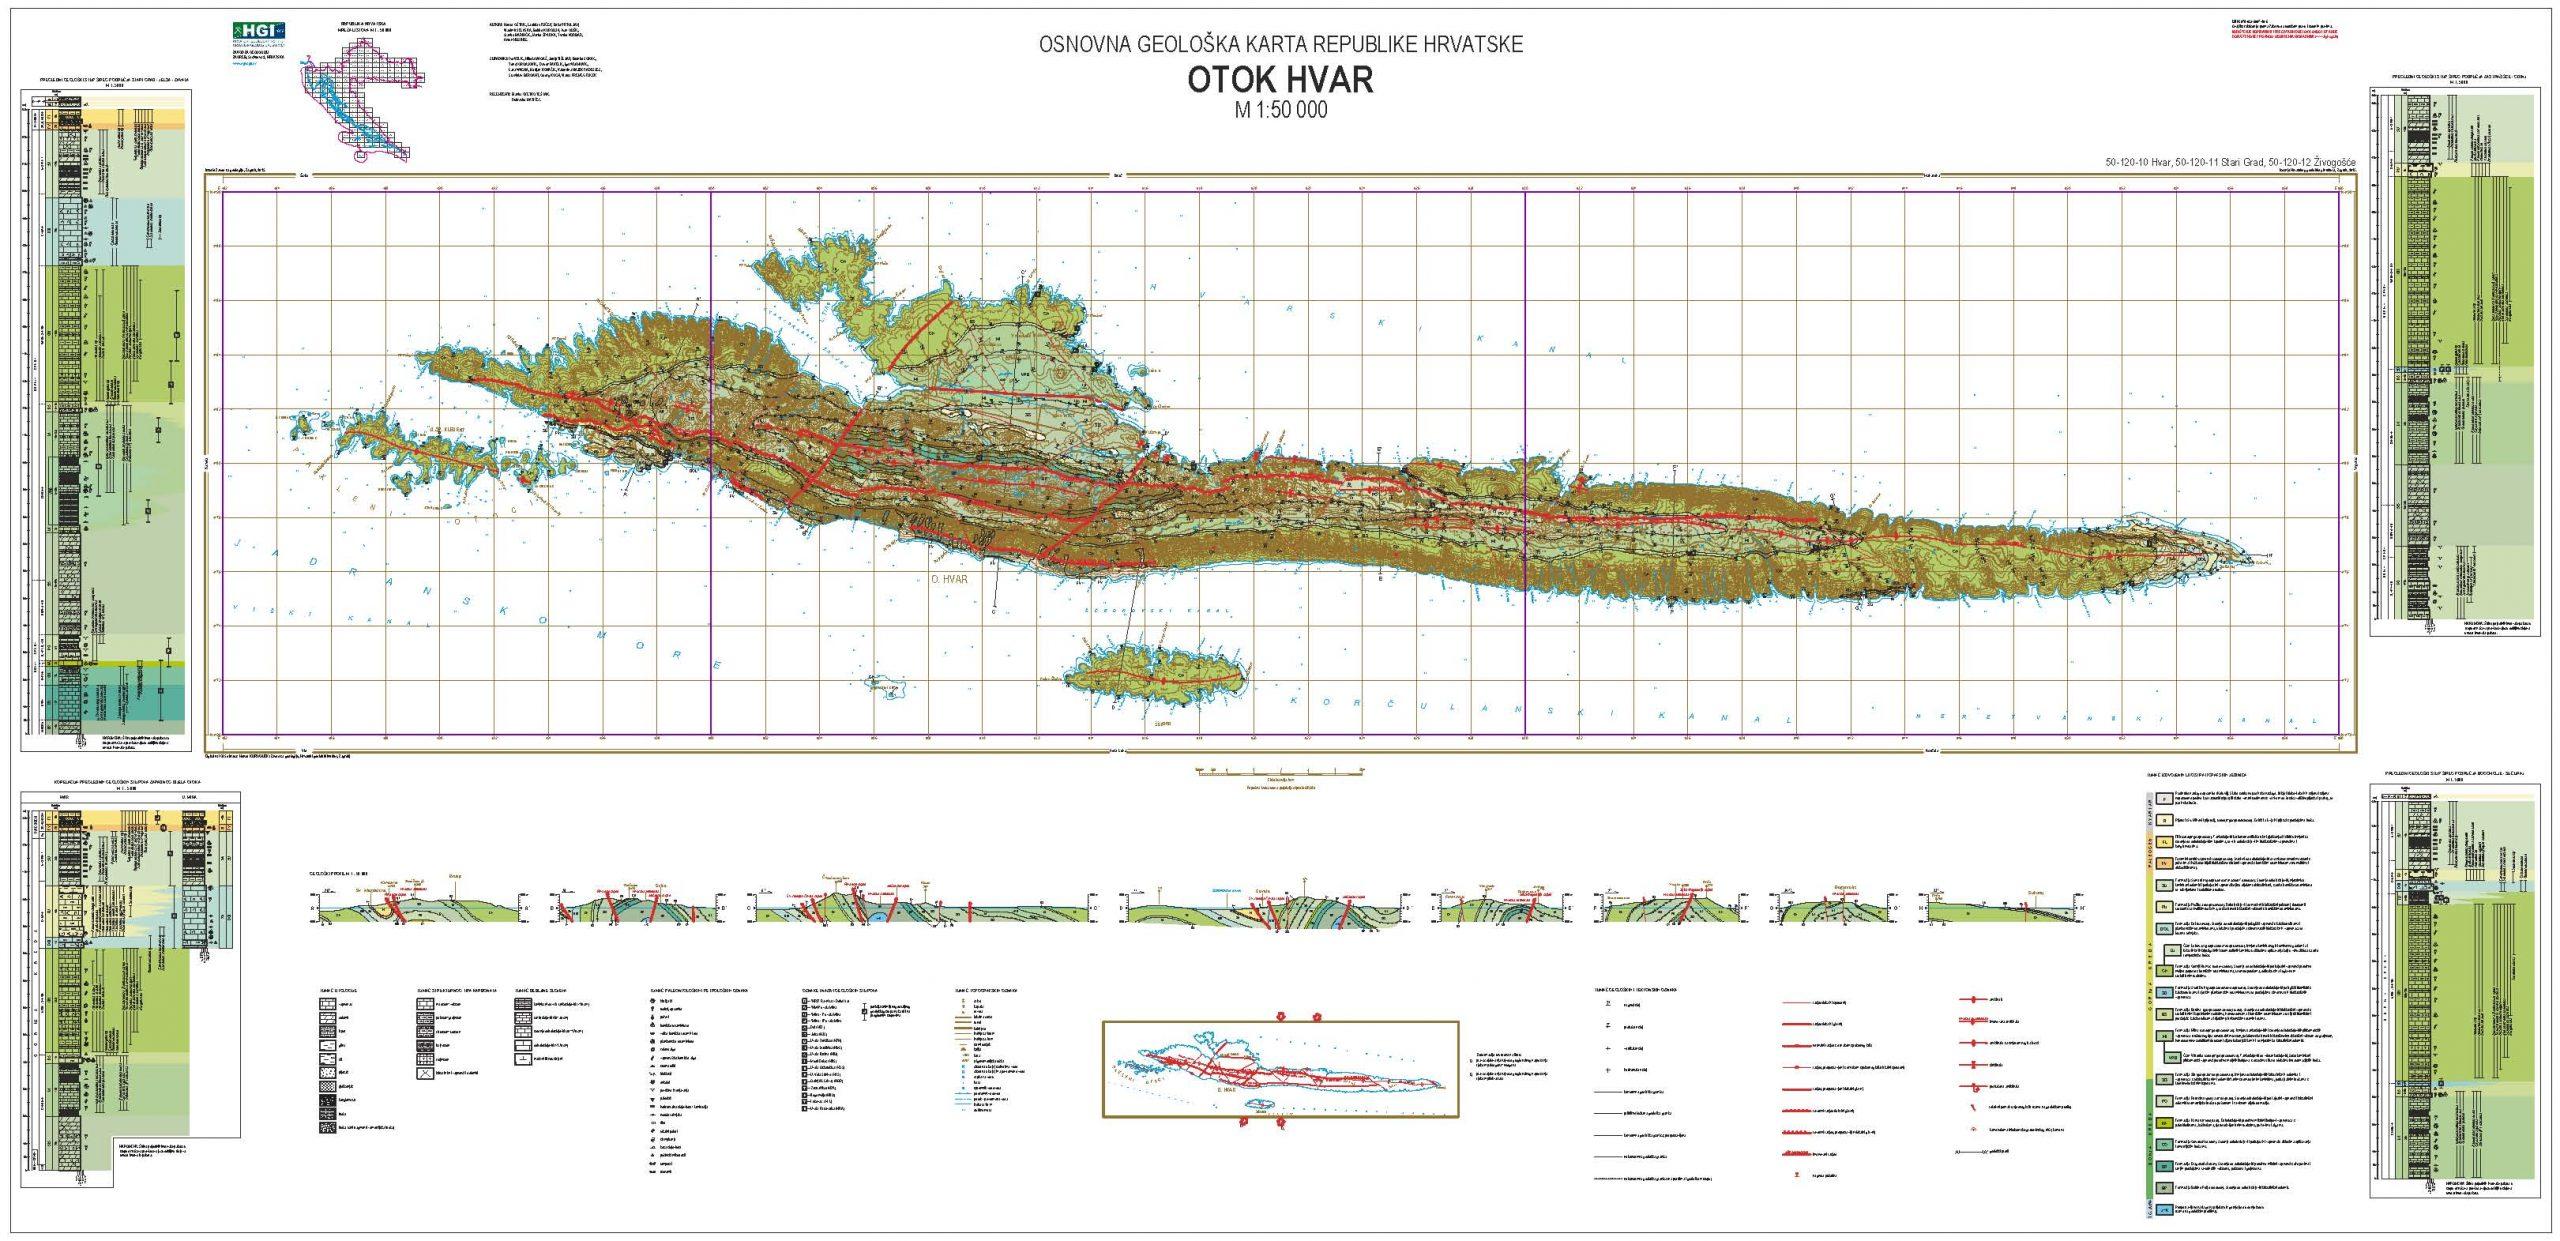 Nova OGK RH otoka Hvara